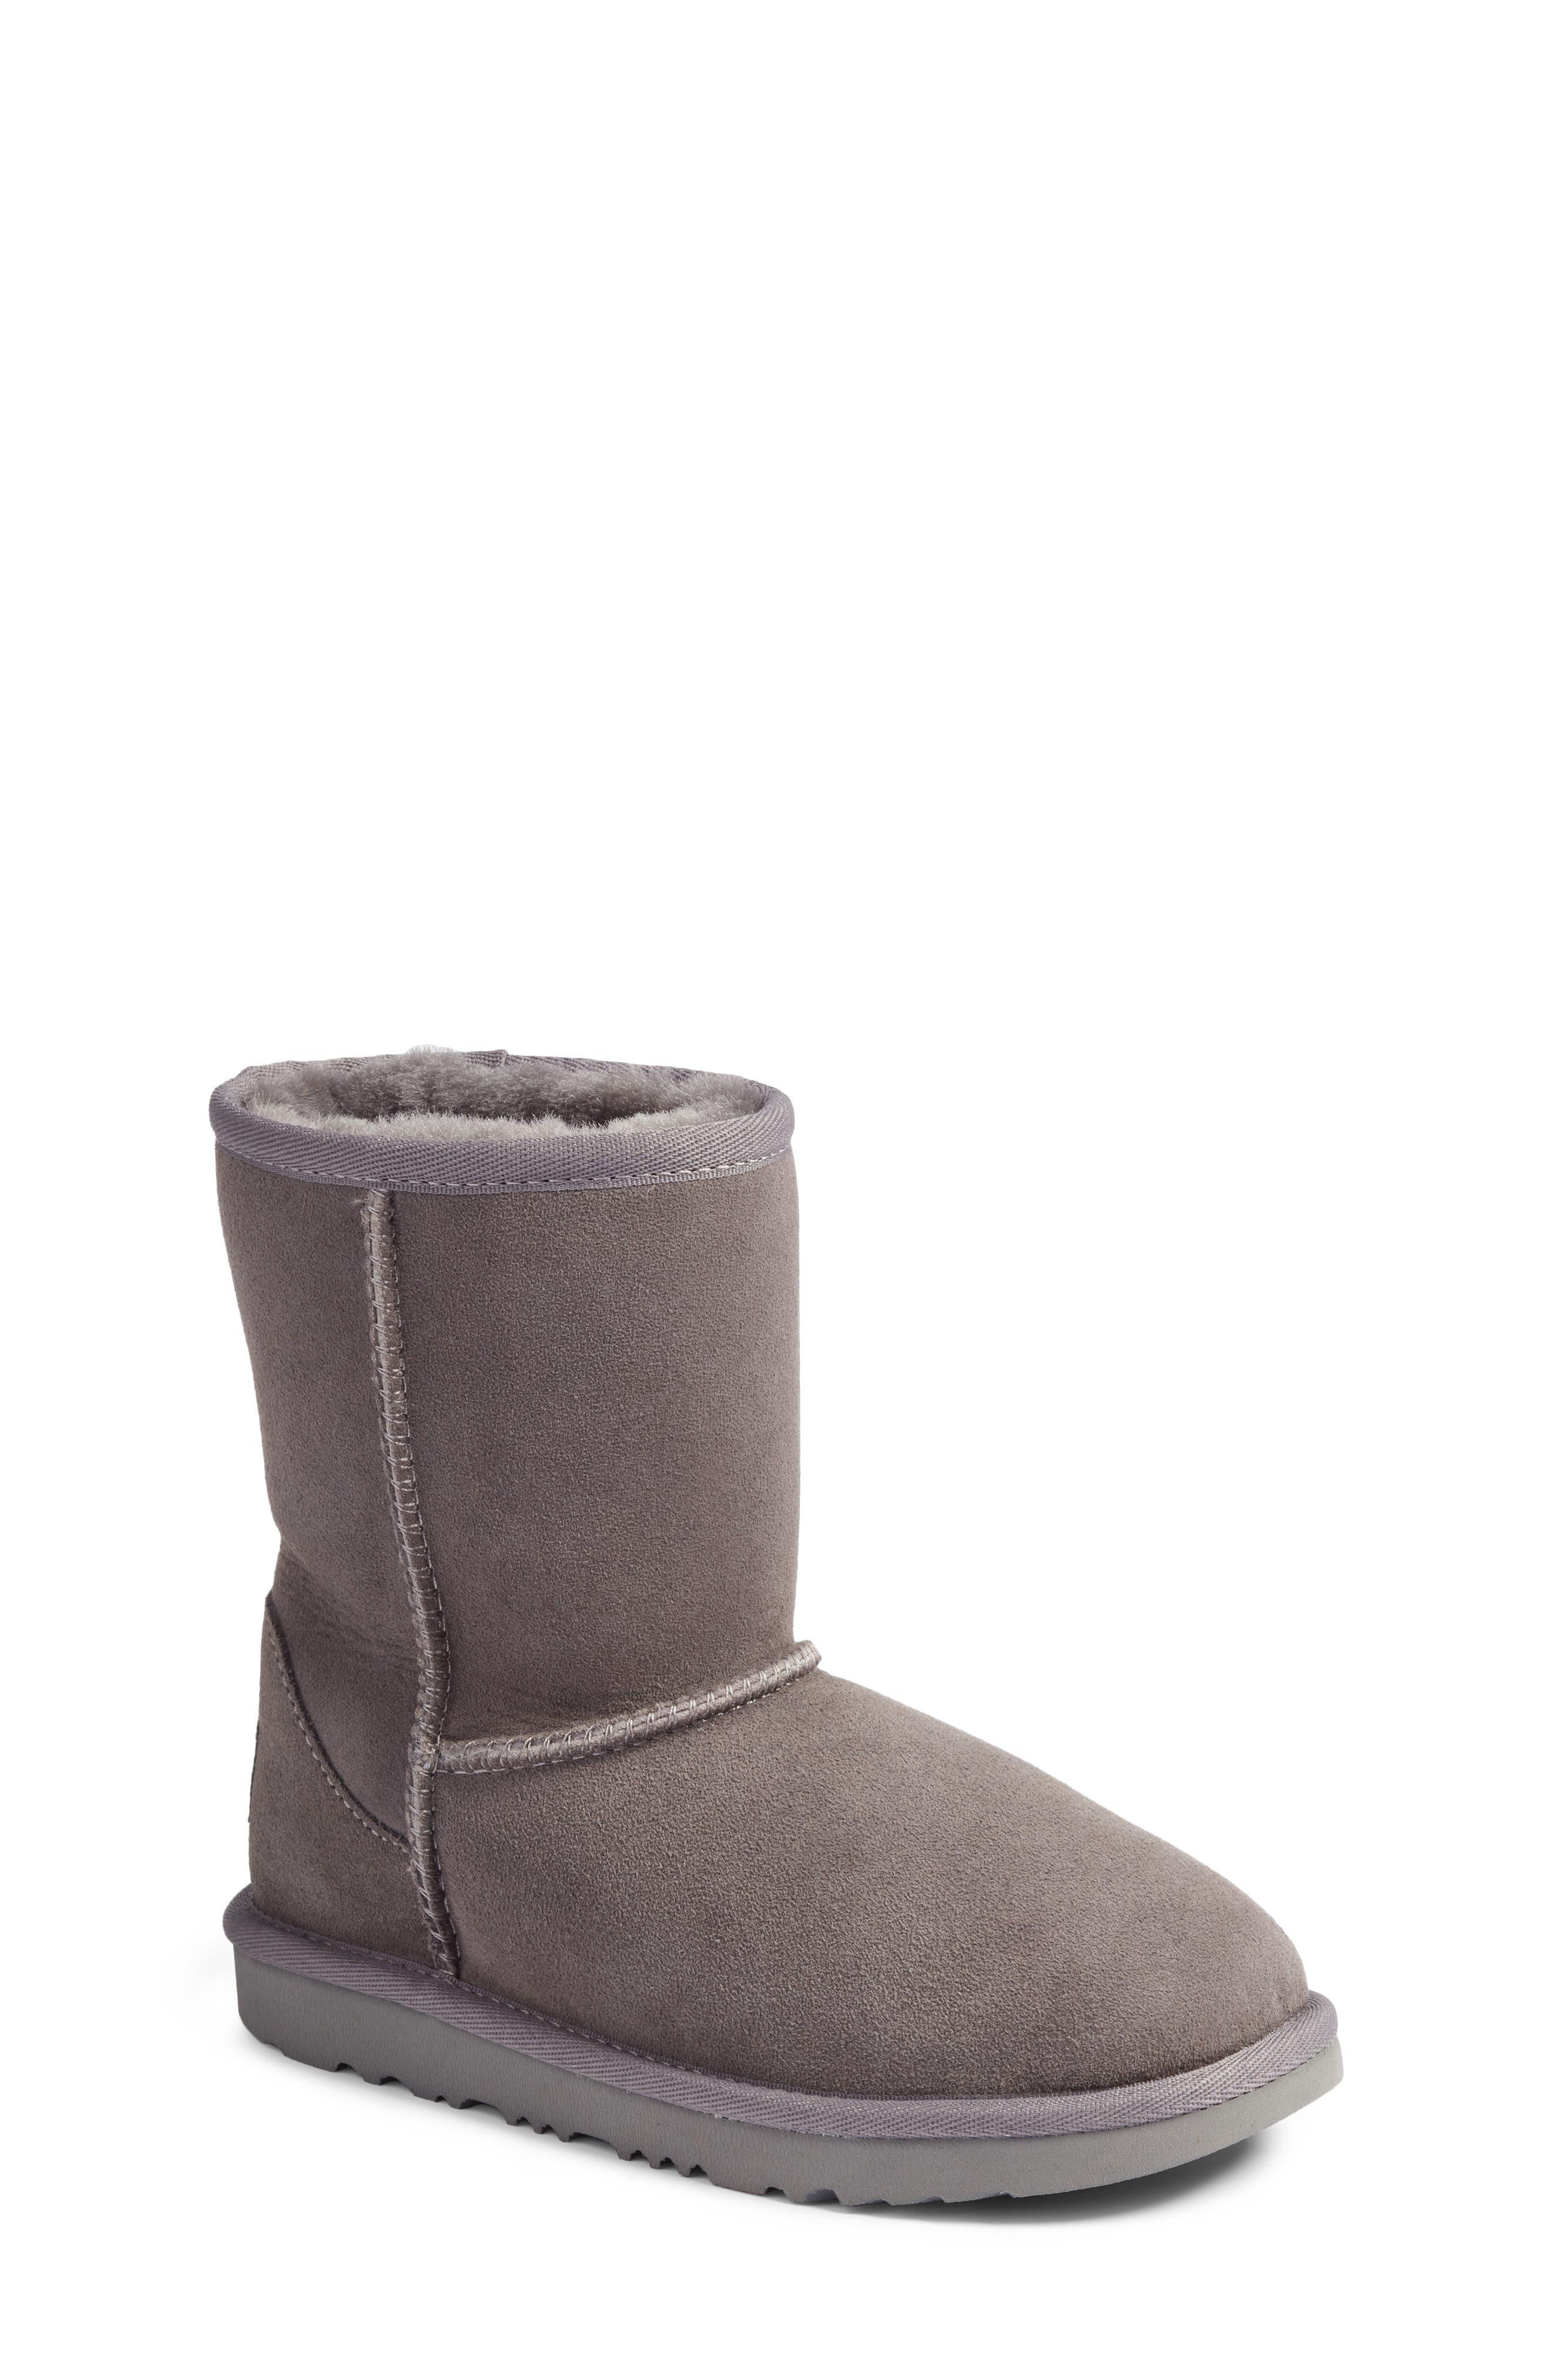 UGG® Classic II Water Resistant Genuine Shearling Boot (Walker, Toddler, Little Kid & Big Kid)